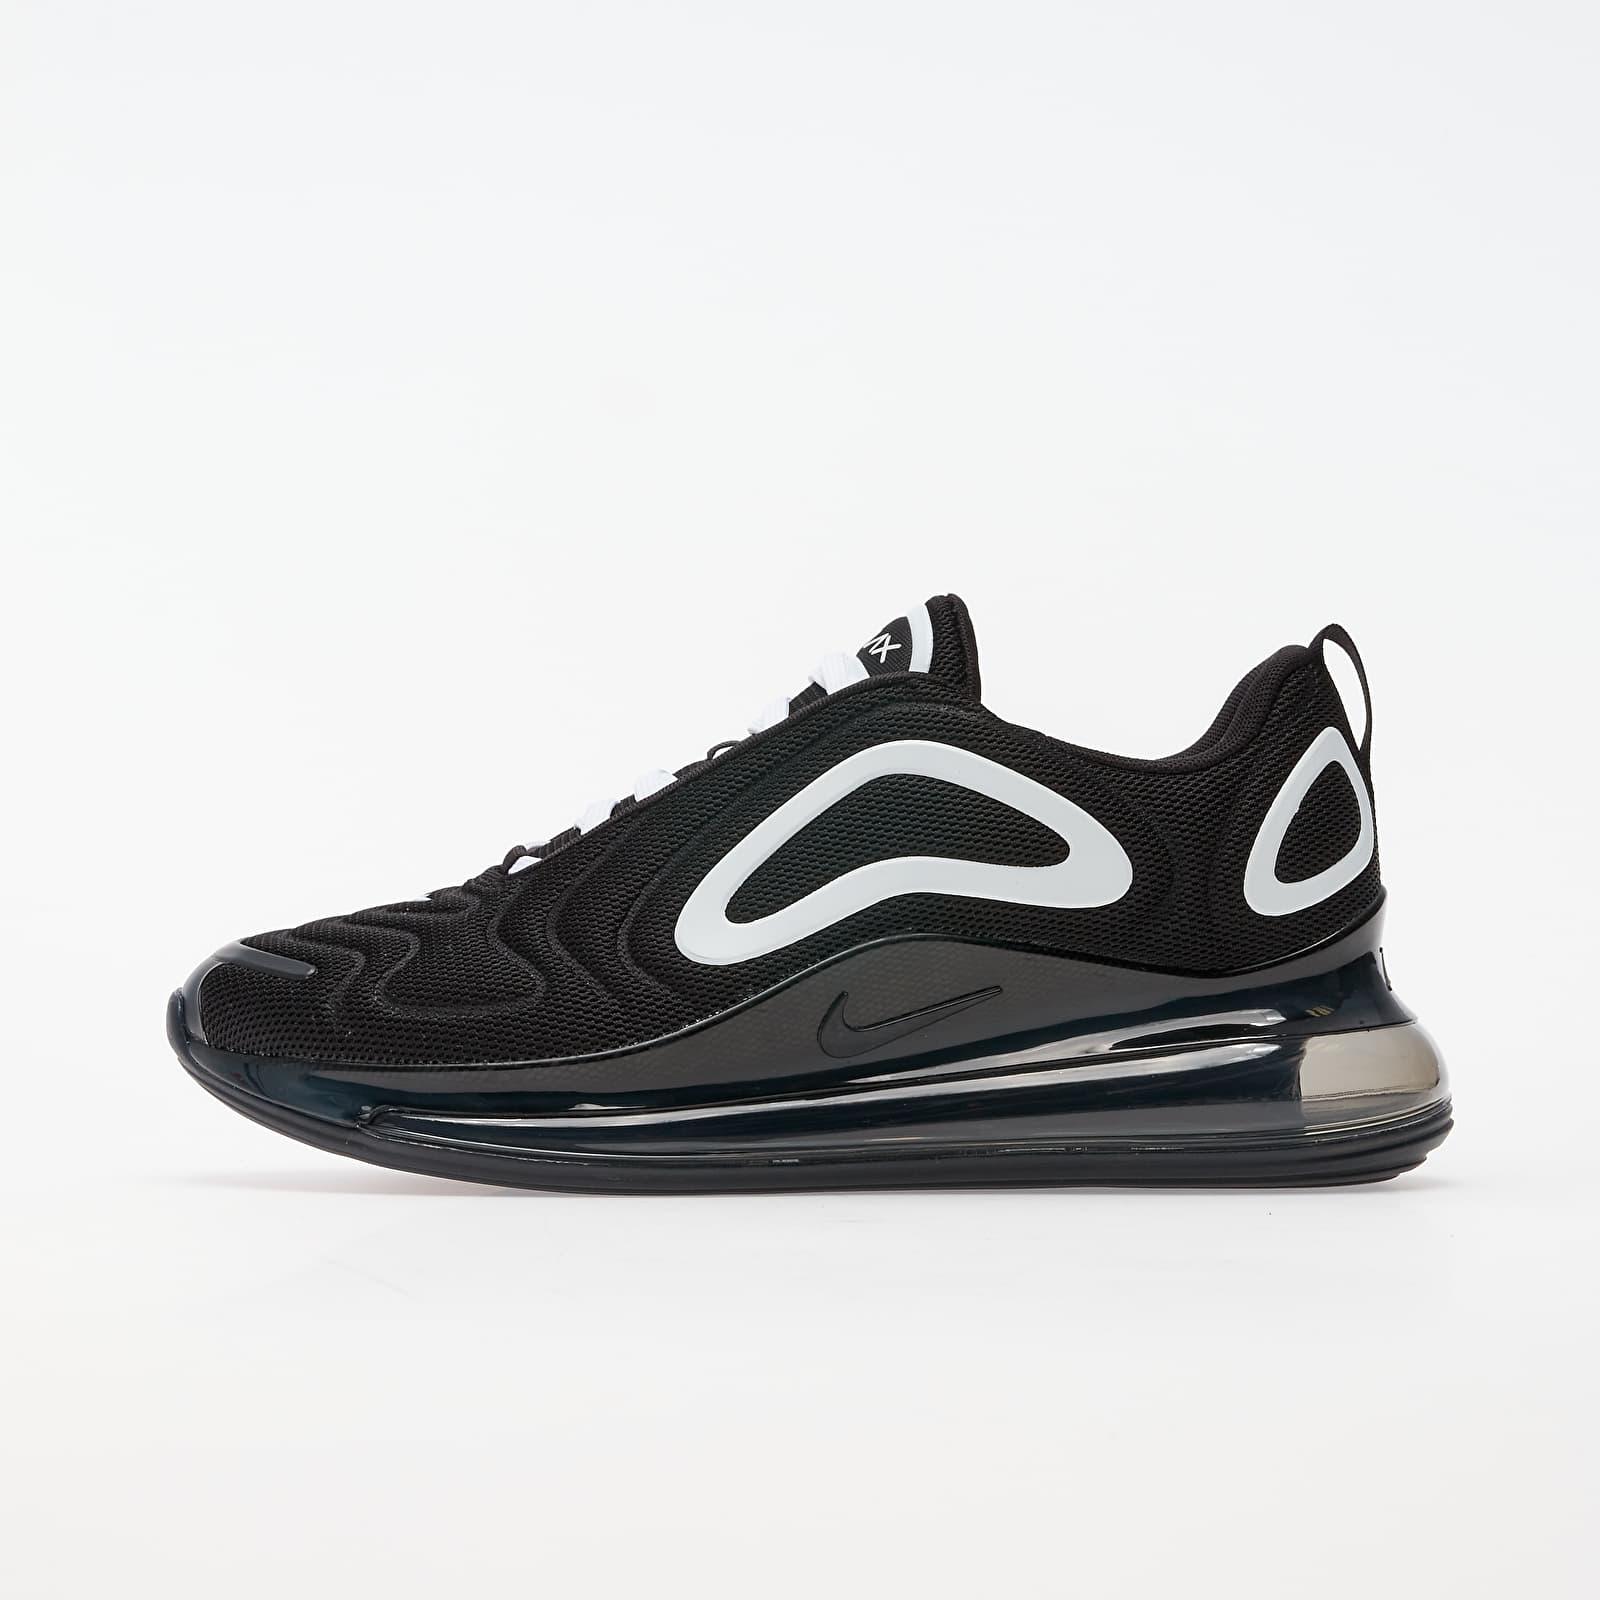 Men's shoes Nike Air Max 720 Black